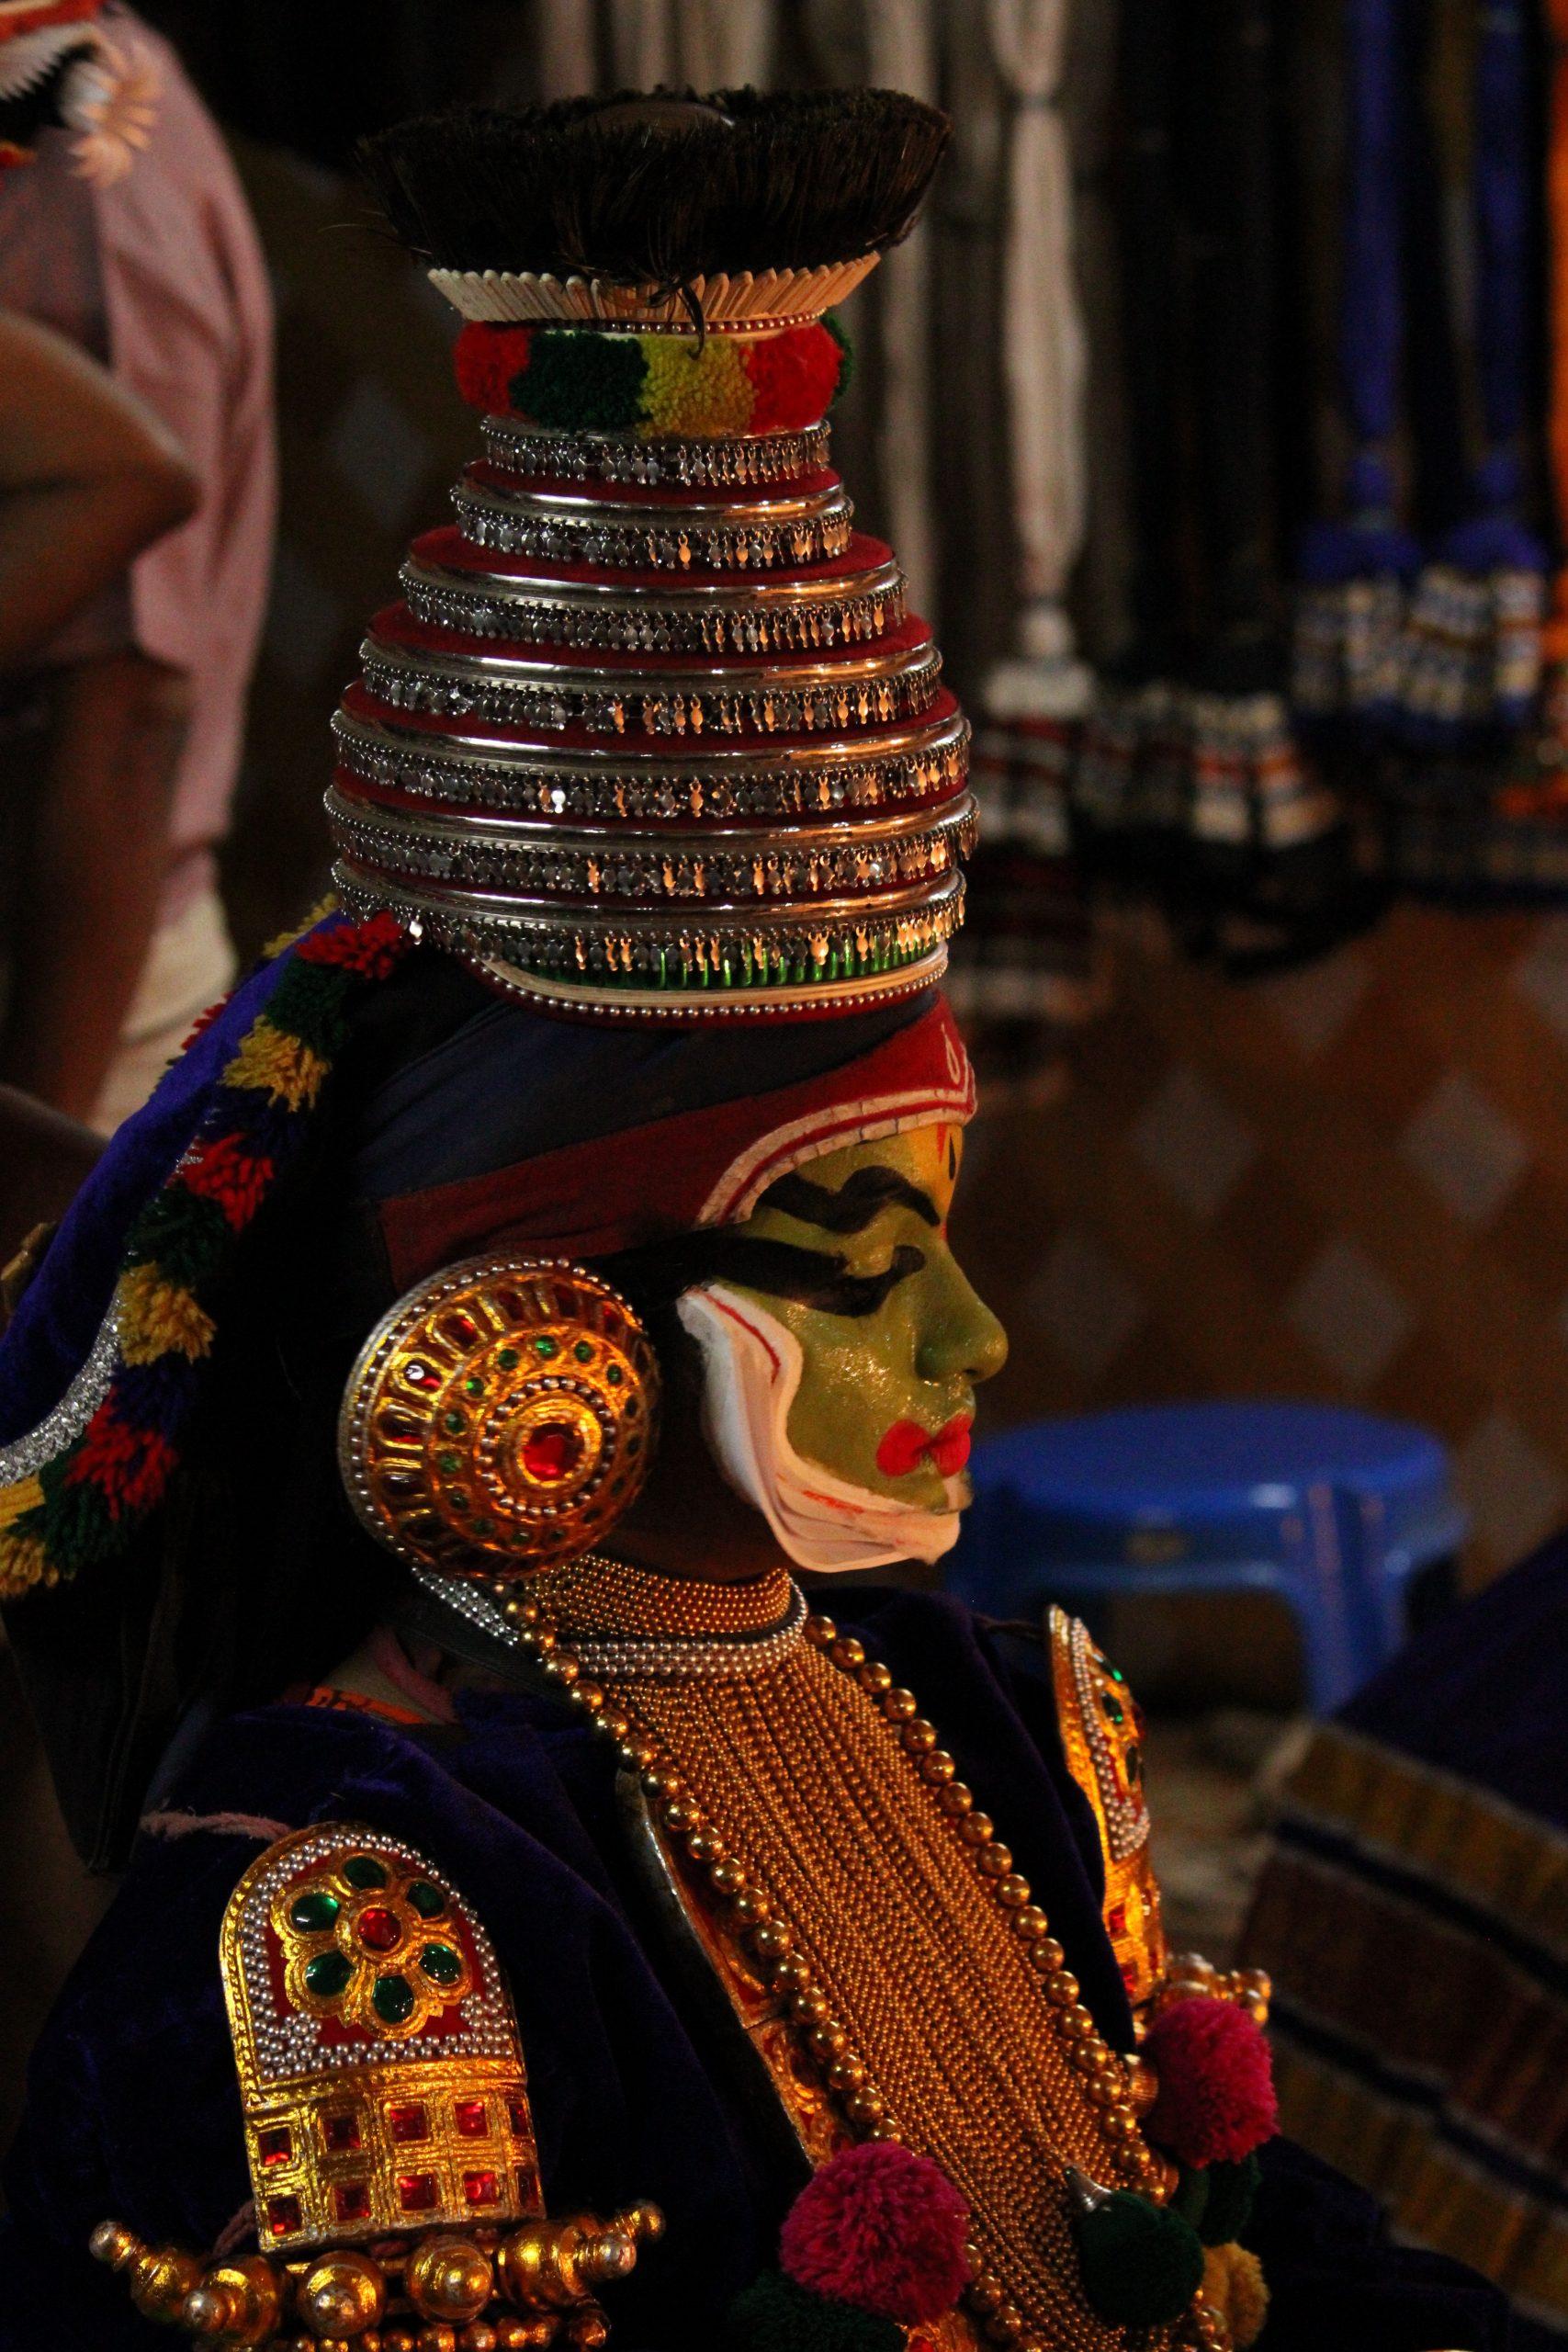 A kathakali dancer